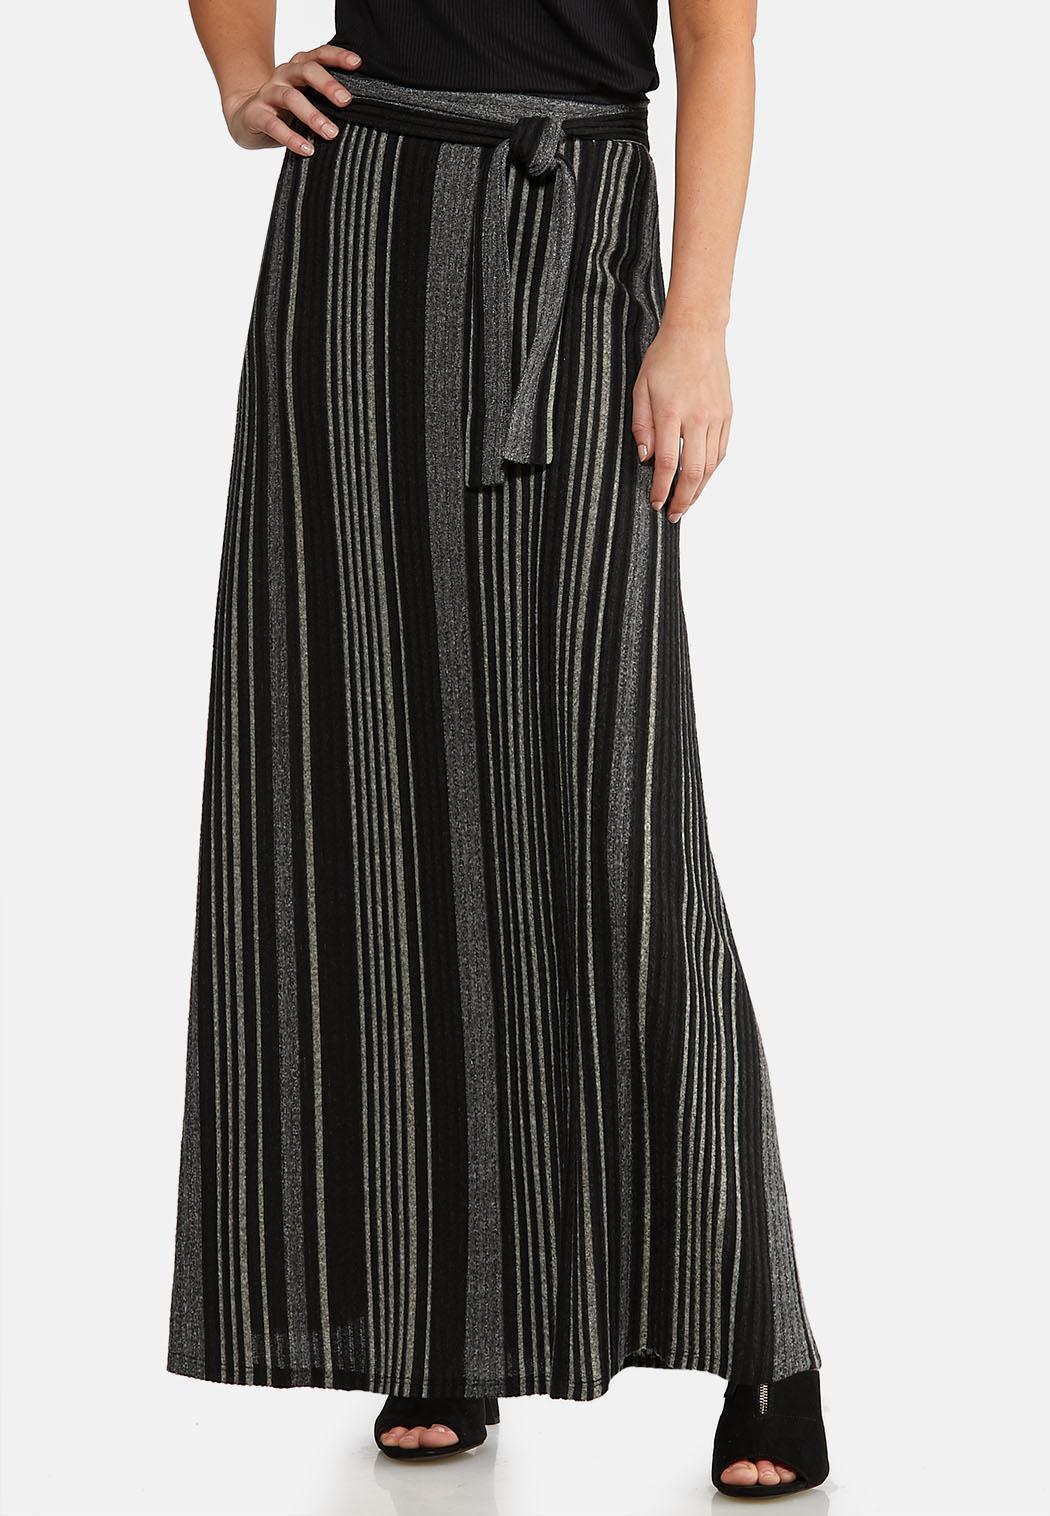 Petite Ribbed Knit Maxi Skirt